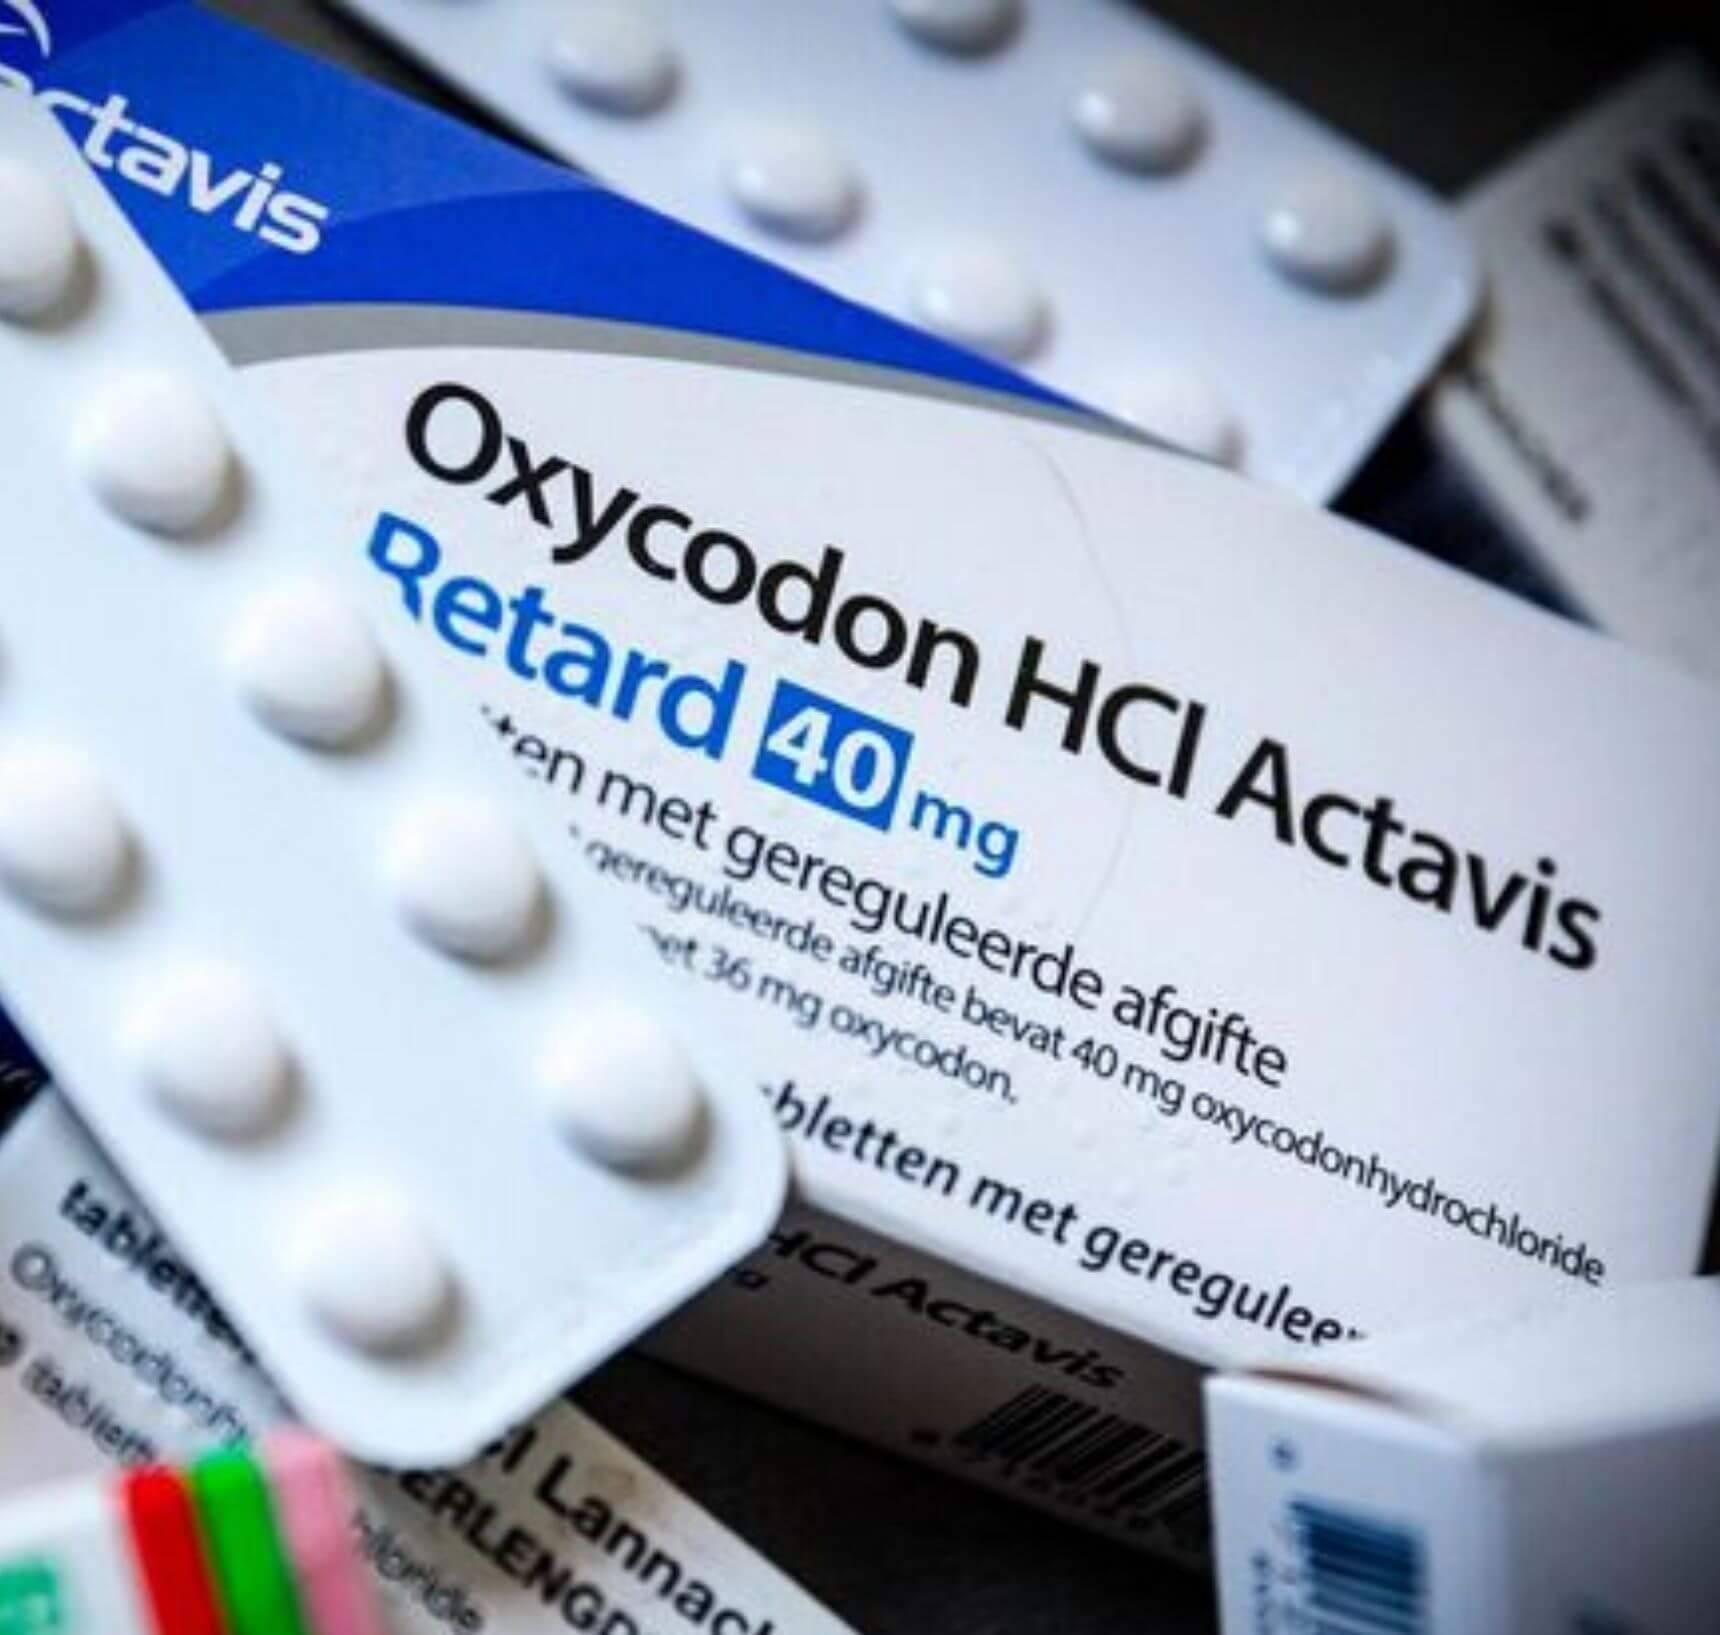 Oxycodon